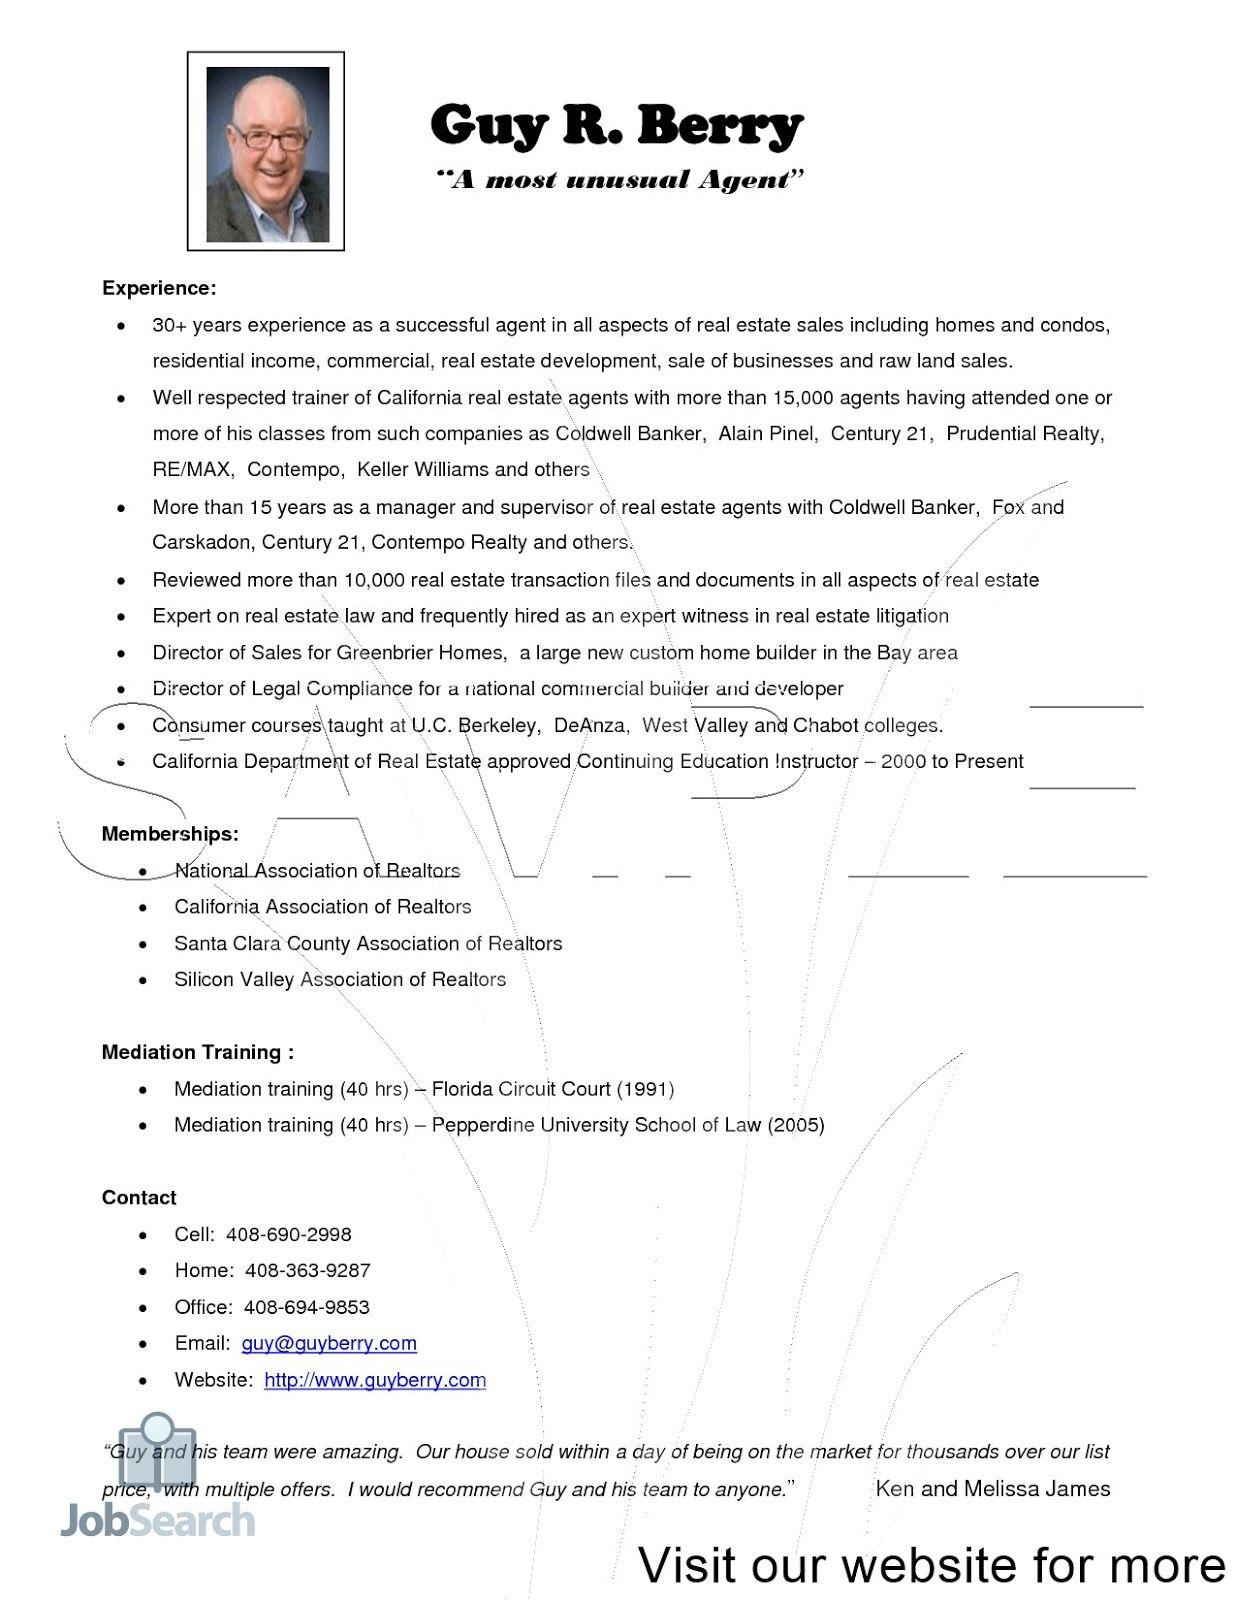 Real Estate Salesperson Resume Objective 2020 in 2020